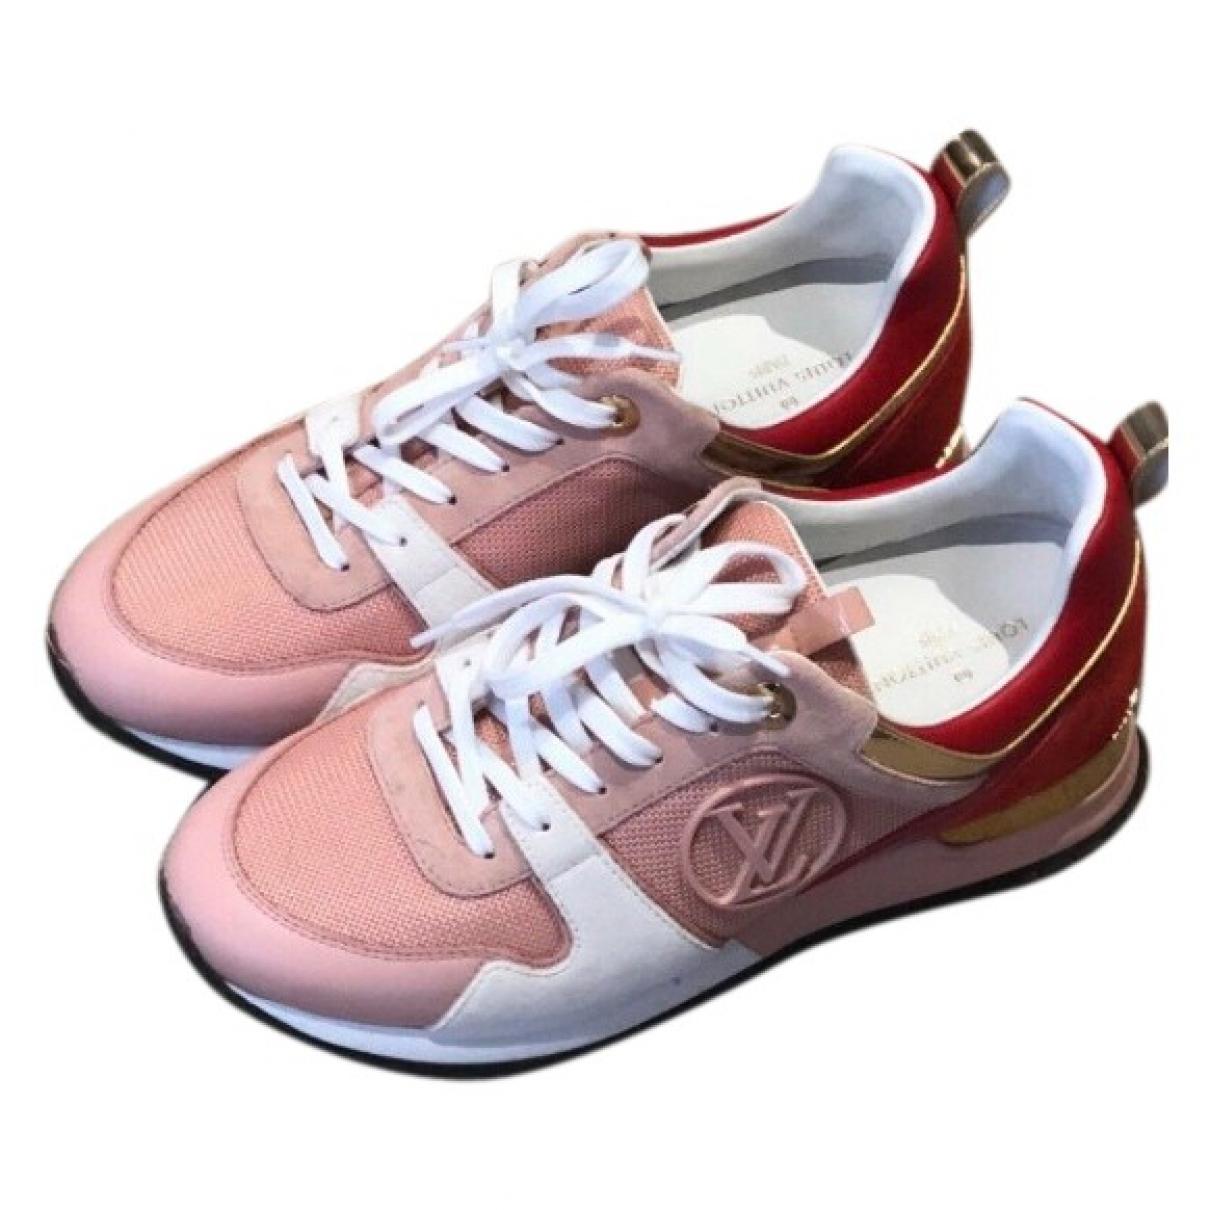 Louis Vuitton - Baskets Run Away pour femme en toile - rose